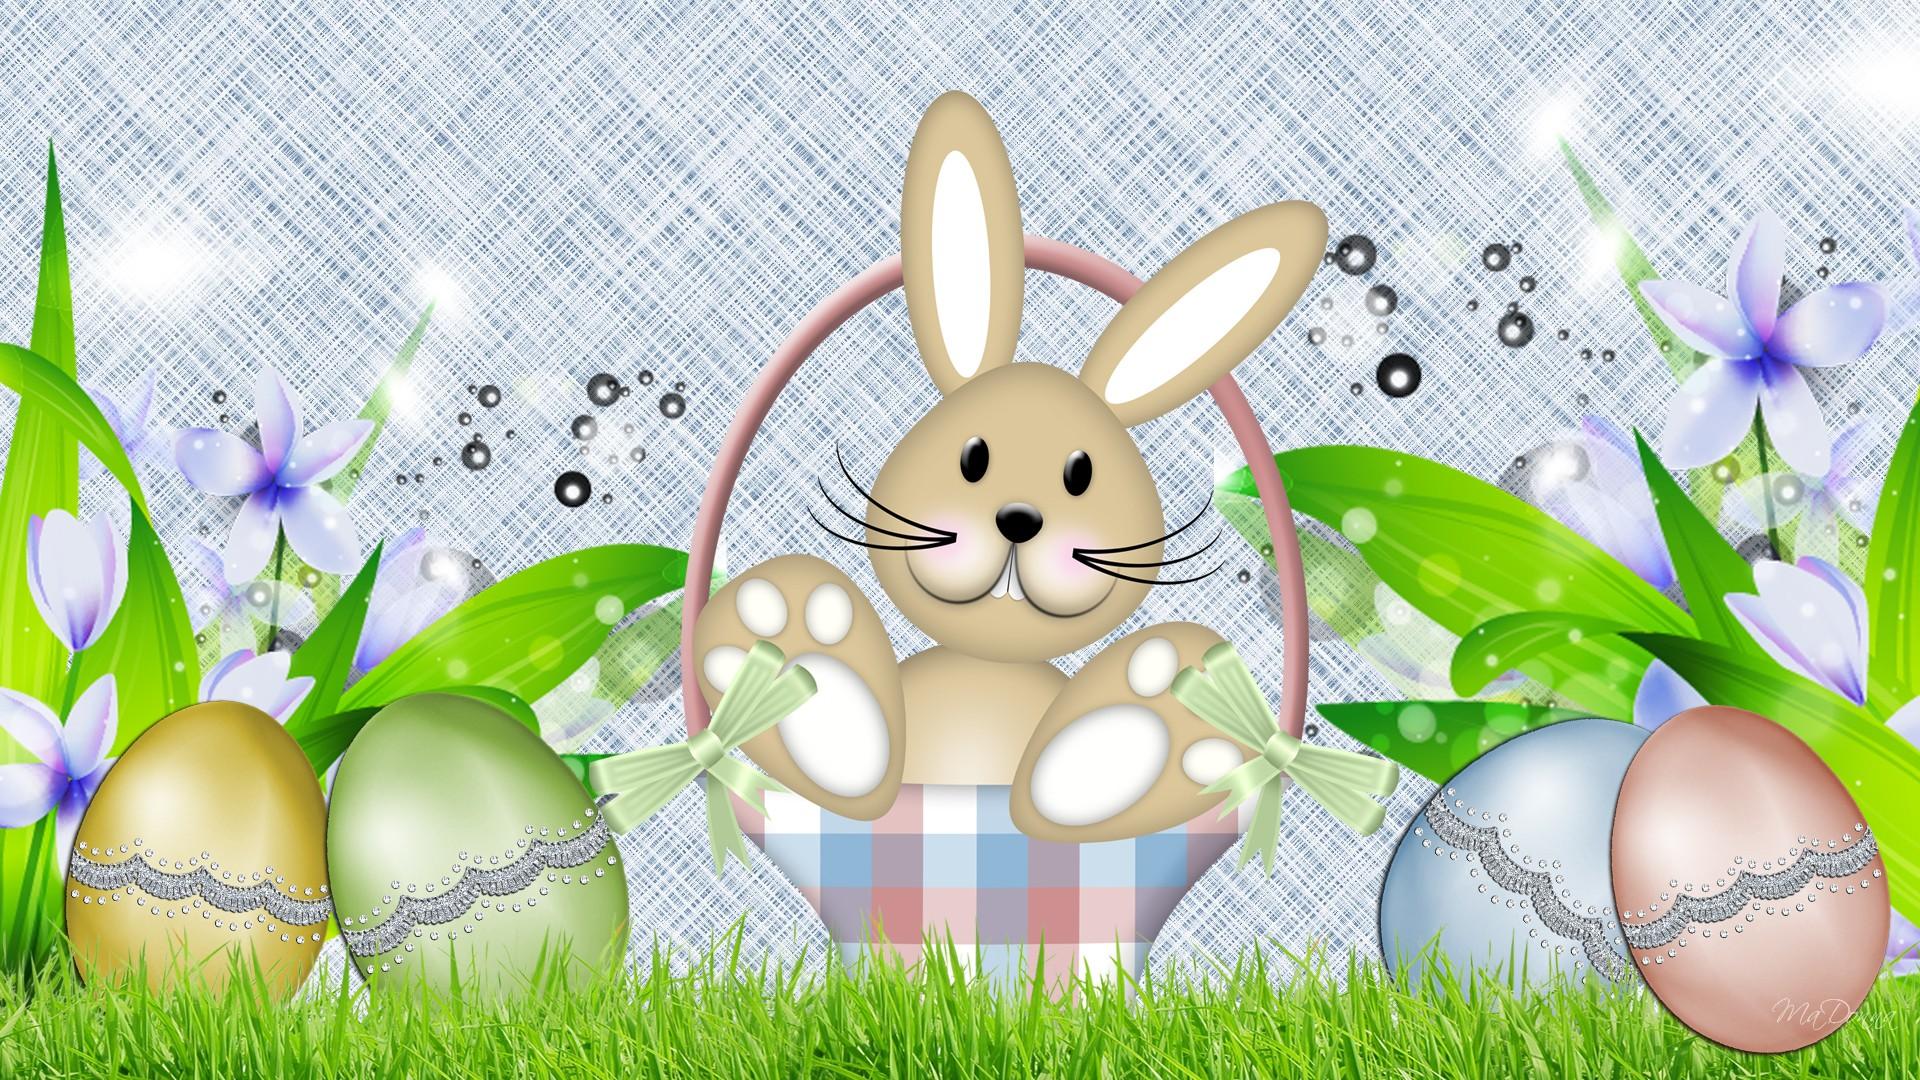 Easter Bunny Wallpaper Backgrounds - WallpaperSafari